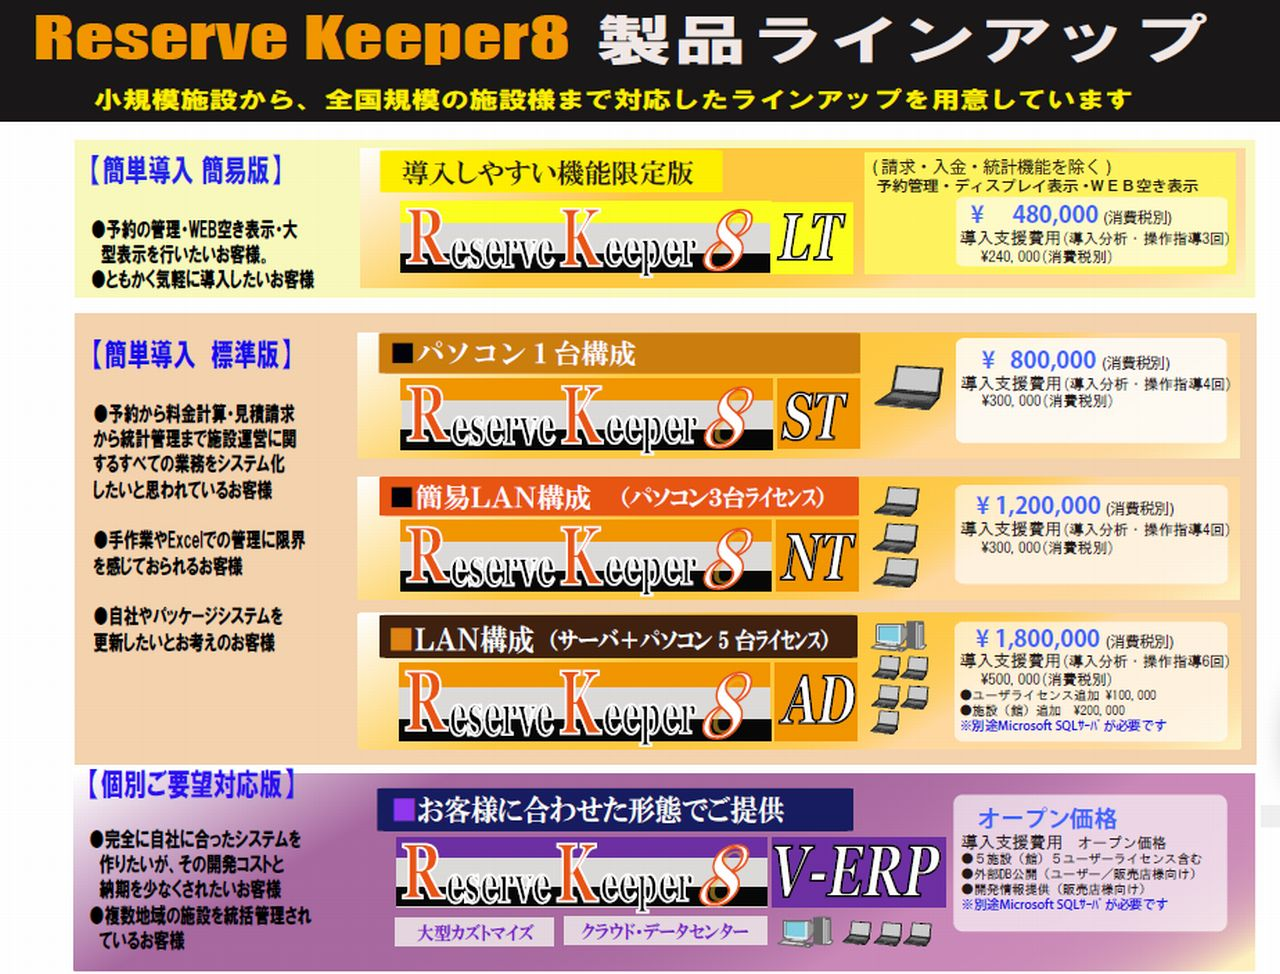 Reserve Keeper8